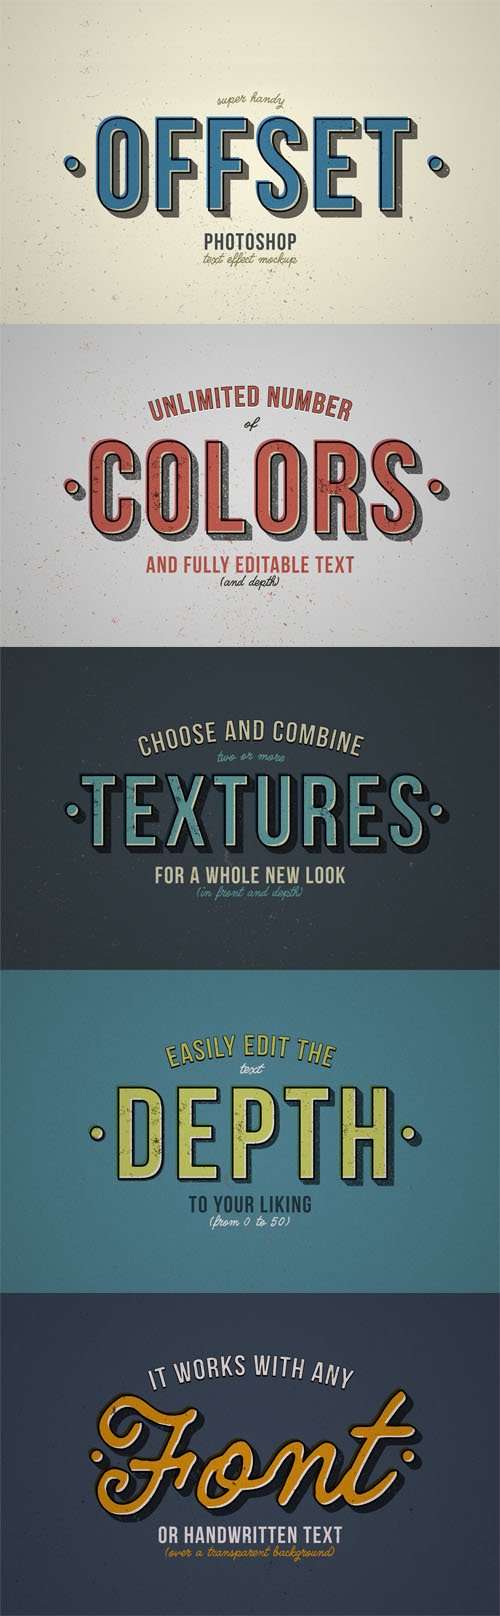 Offset Photoshop Text Effect Mockup